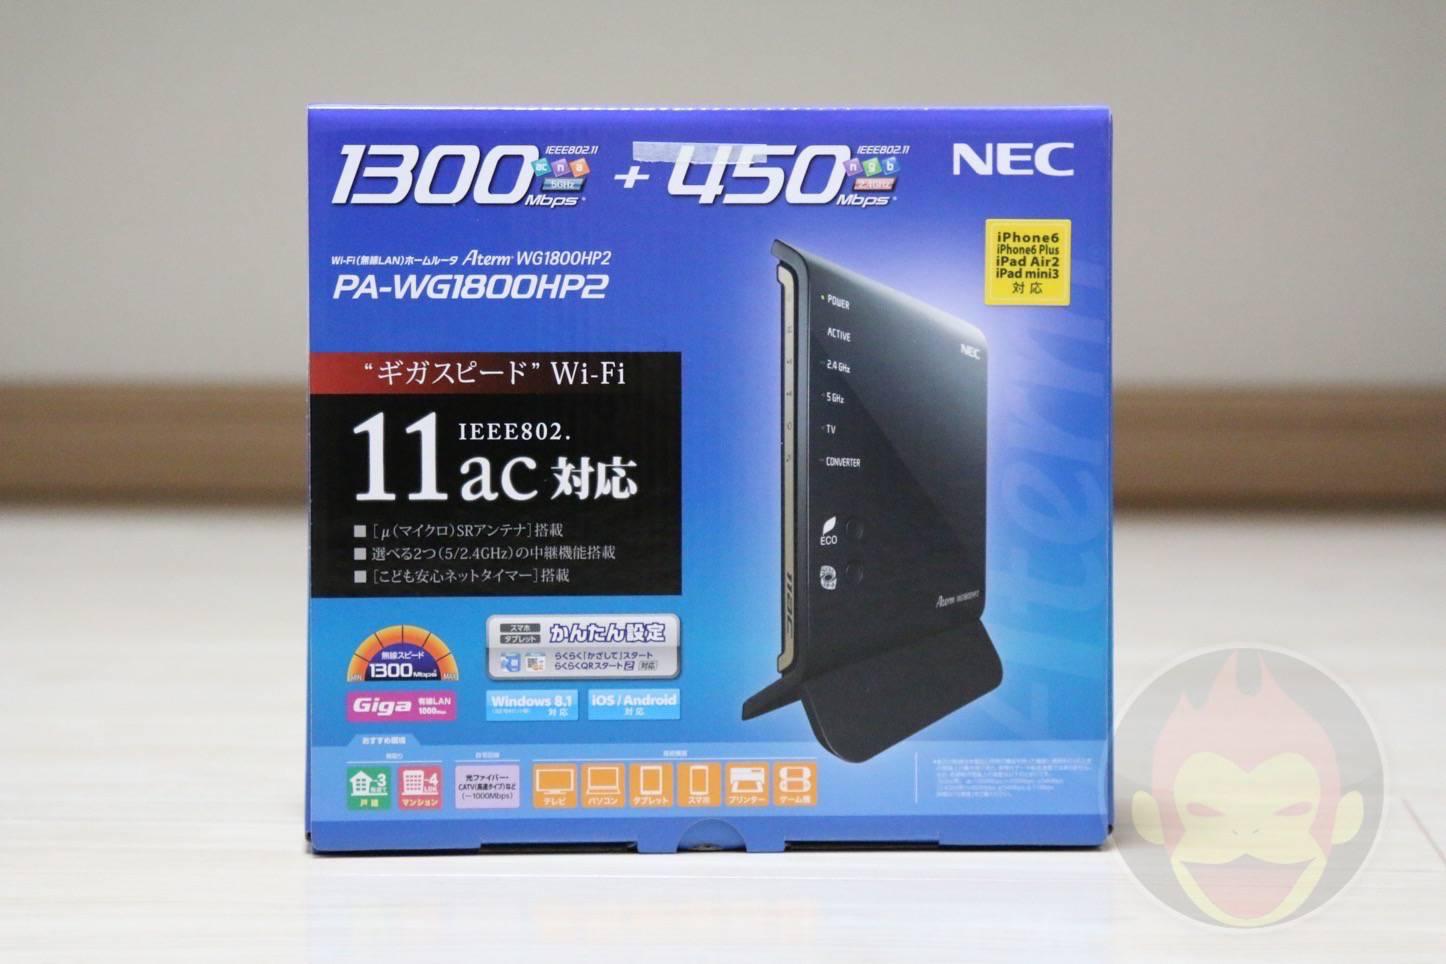 NEC-Aterm-PA-WG1800HP2-11.JPG